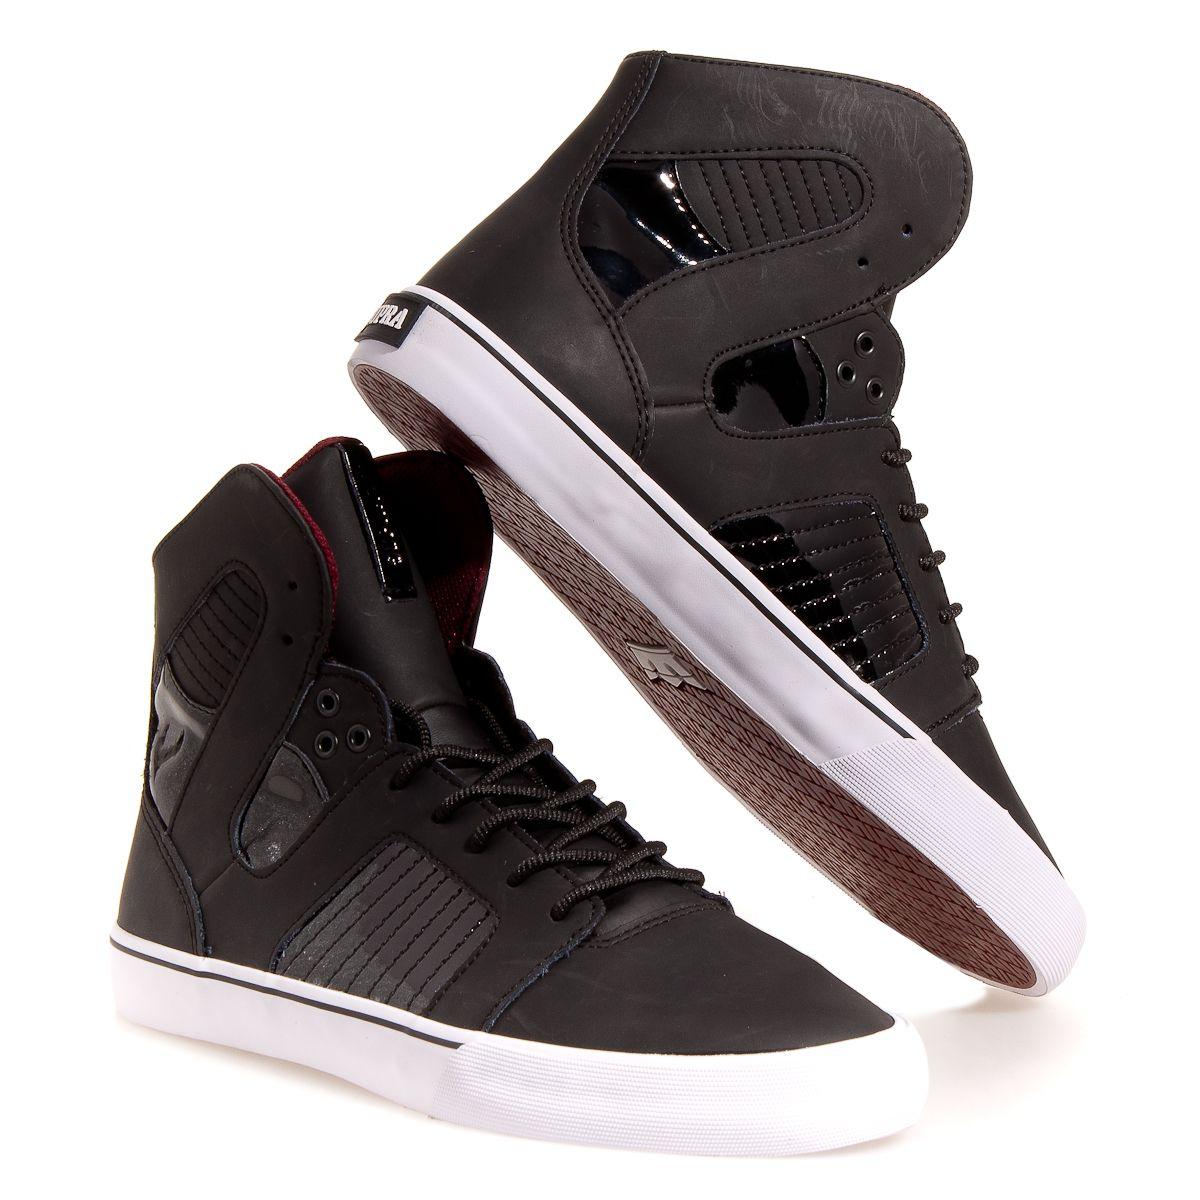 Supra Pilot Men's Skate Shoes: Black 7.5